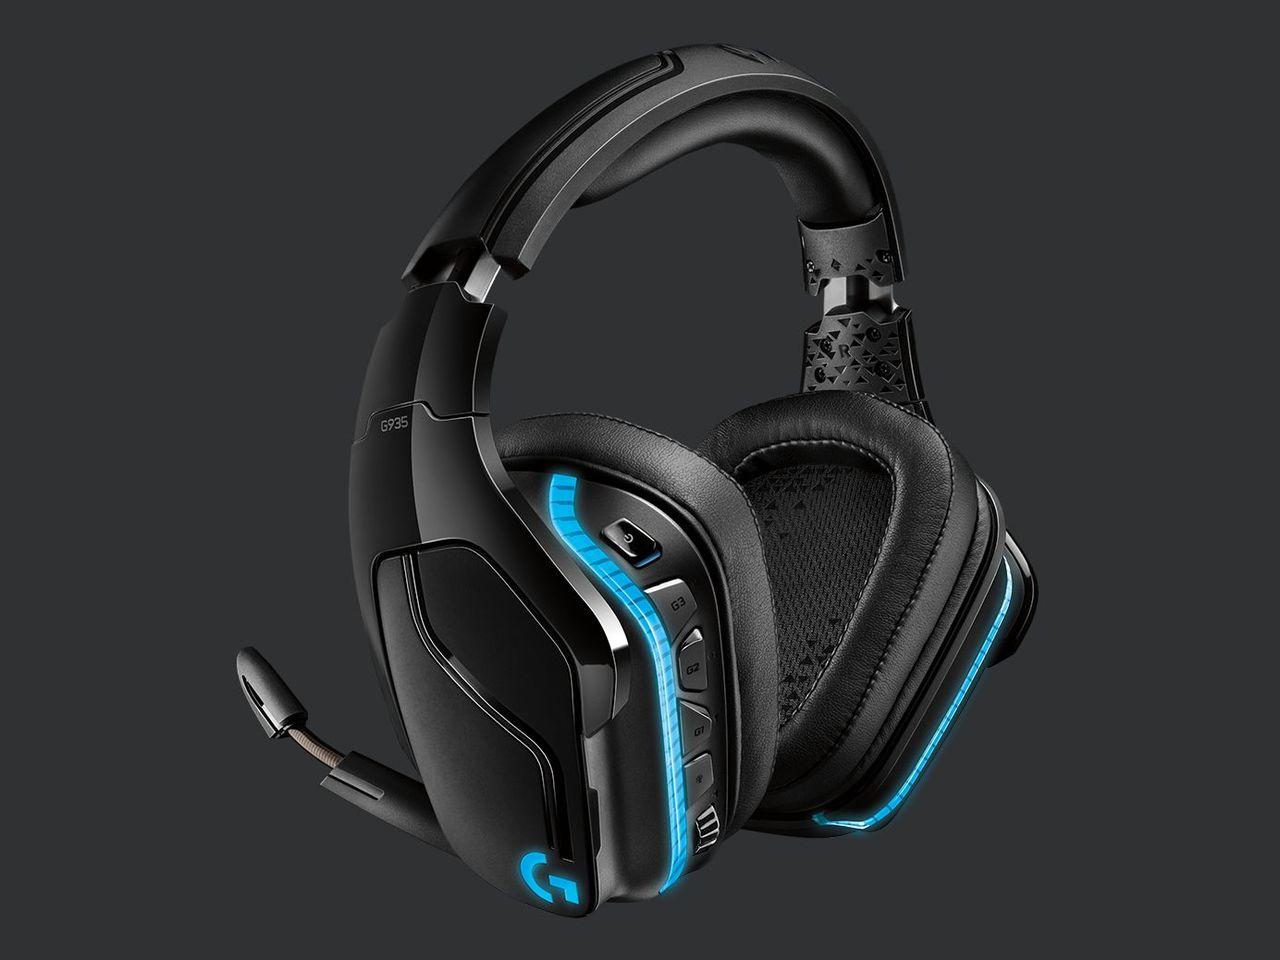 Logitech presenterar trådlösa headsetet G935